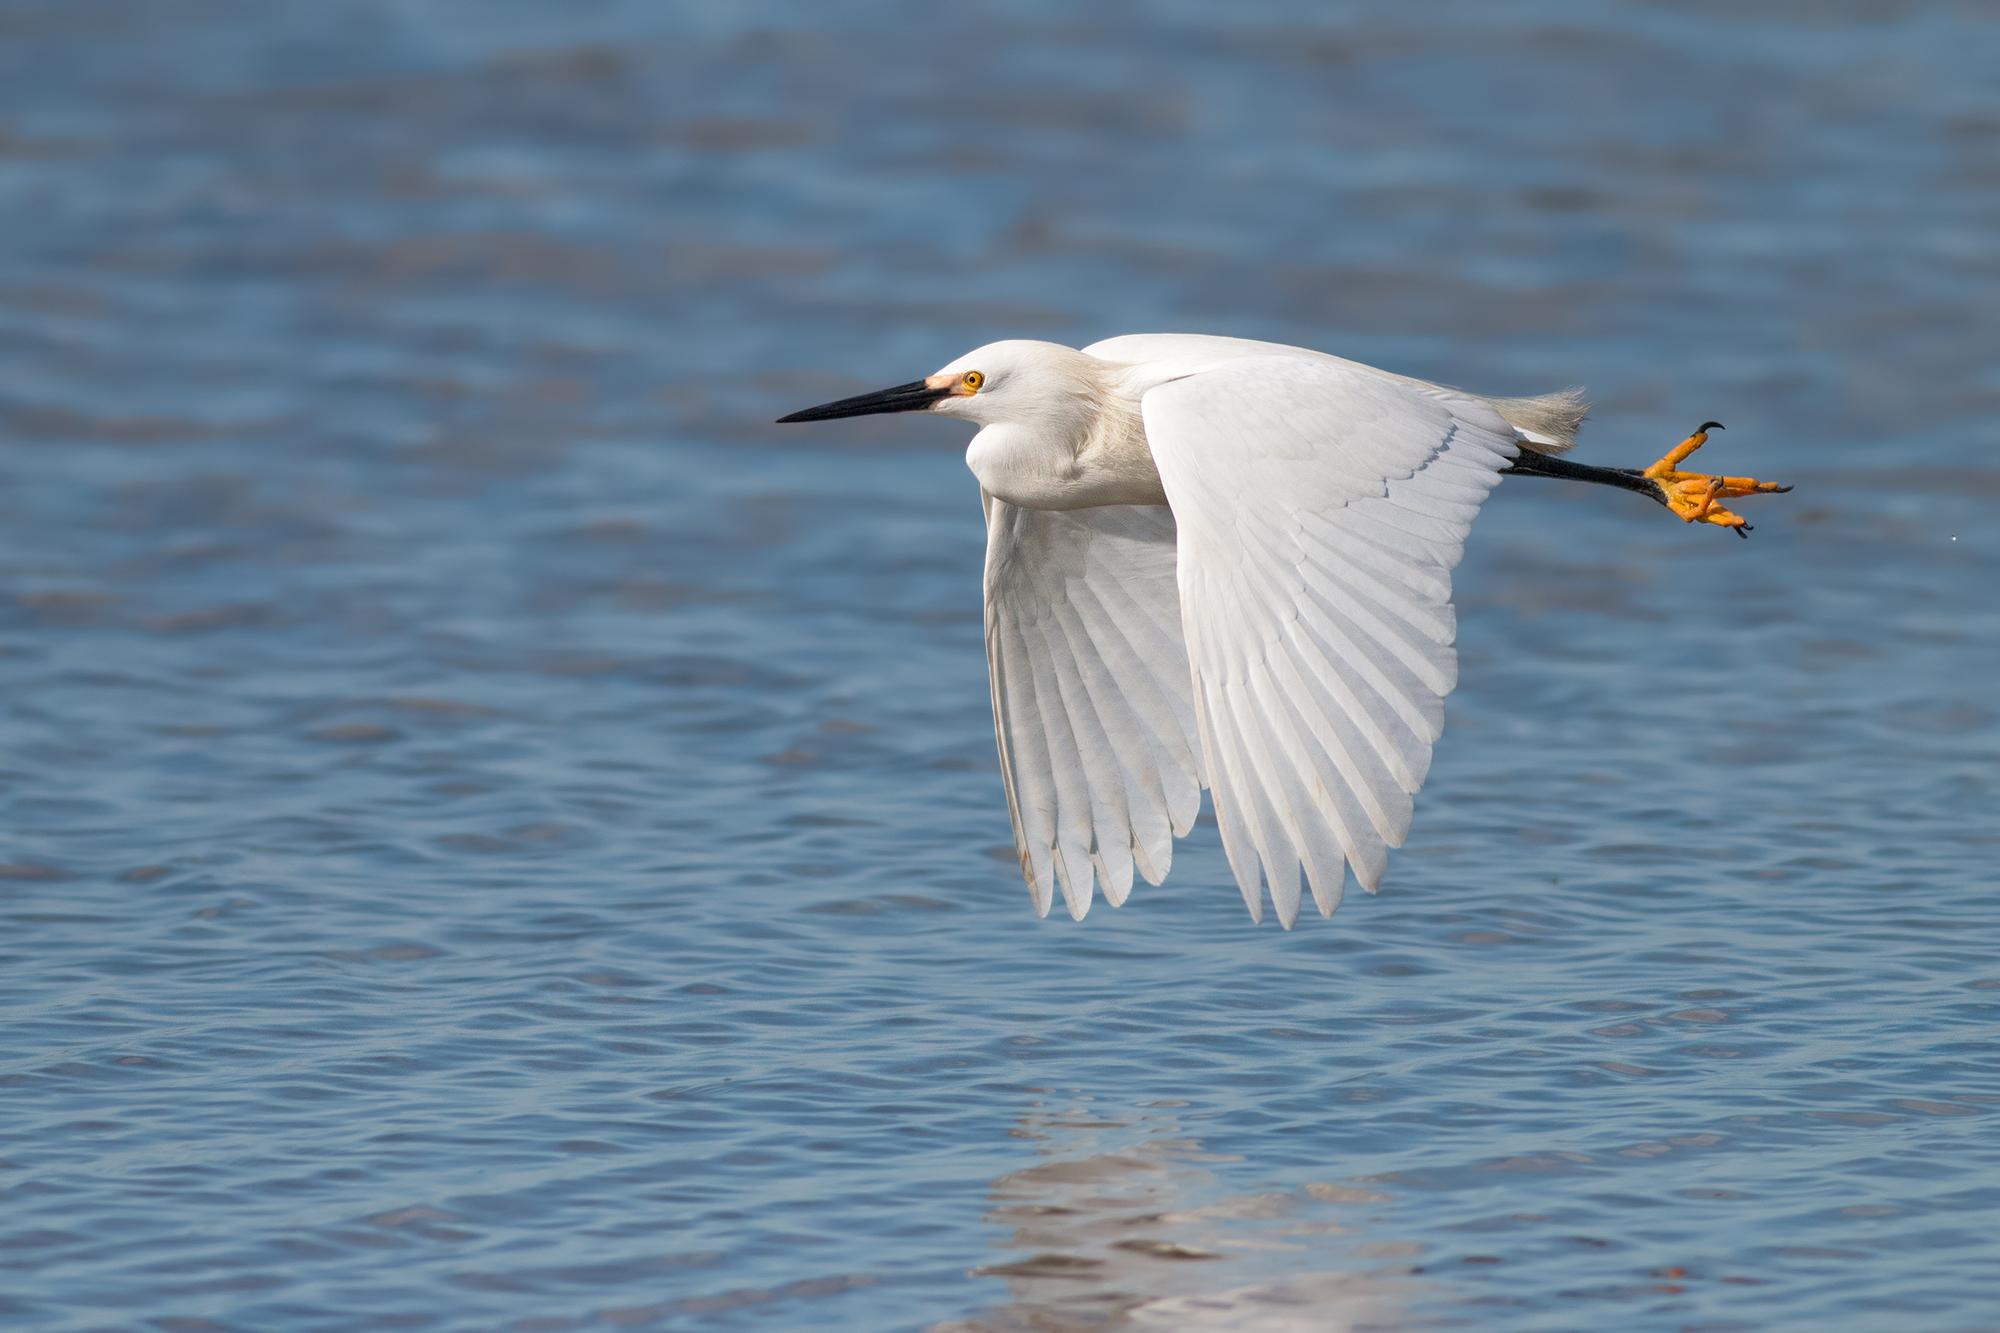 Snowy-Egret-JPEG_web.jpg